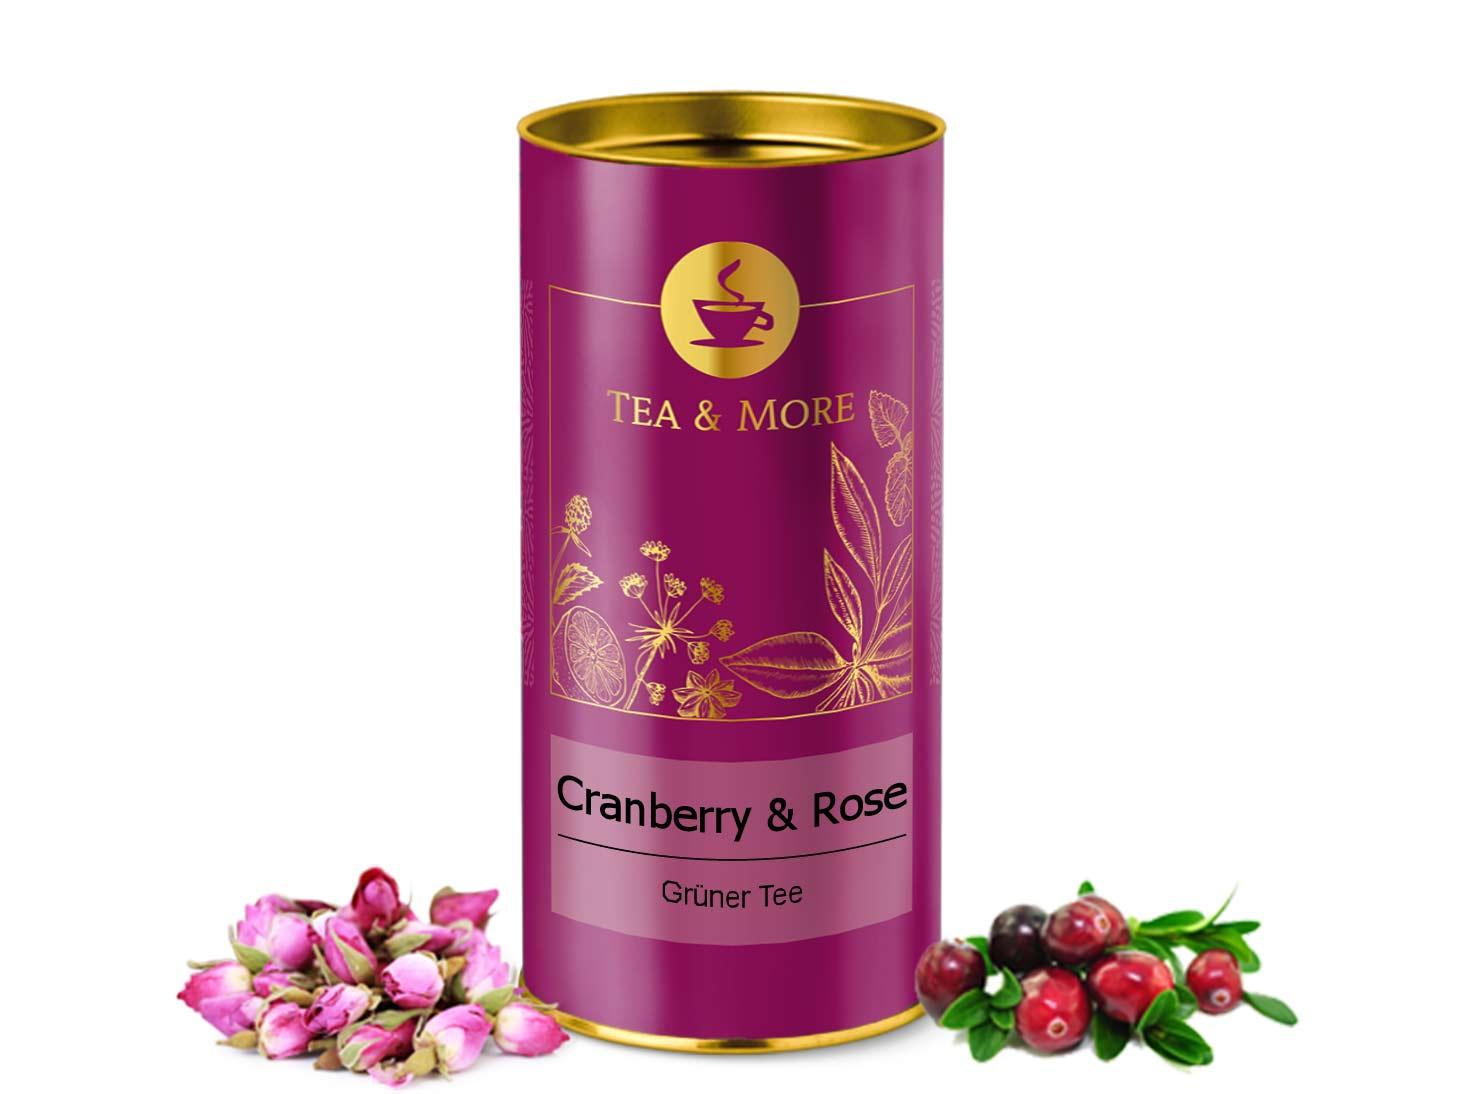 Grüner Tee Cranberry & Rose